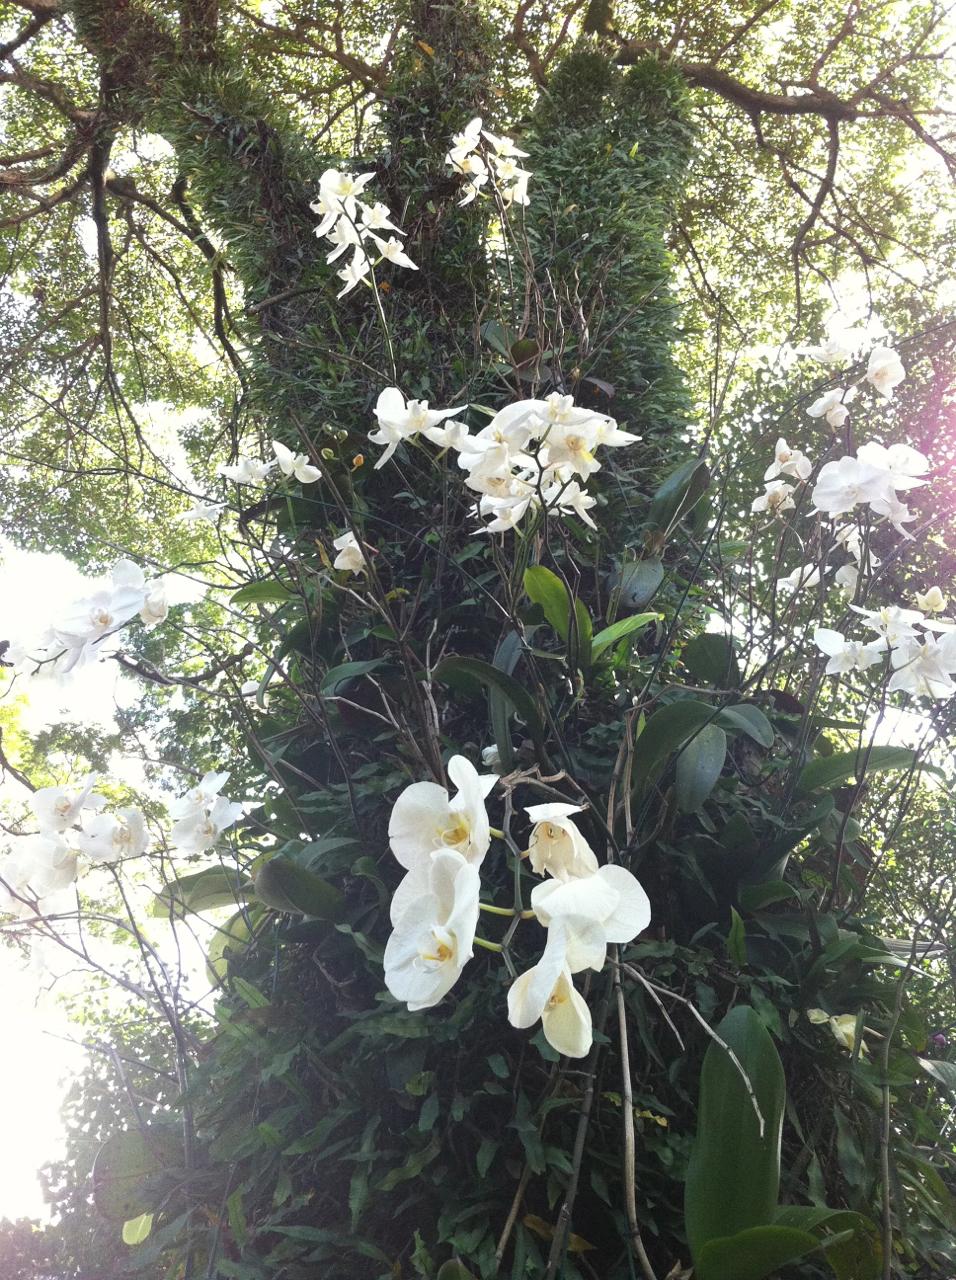 Orquídeas colocadas voluntariamente nas árvores da cidade